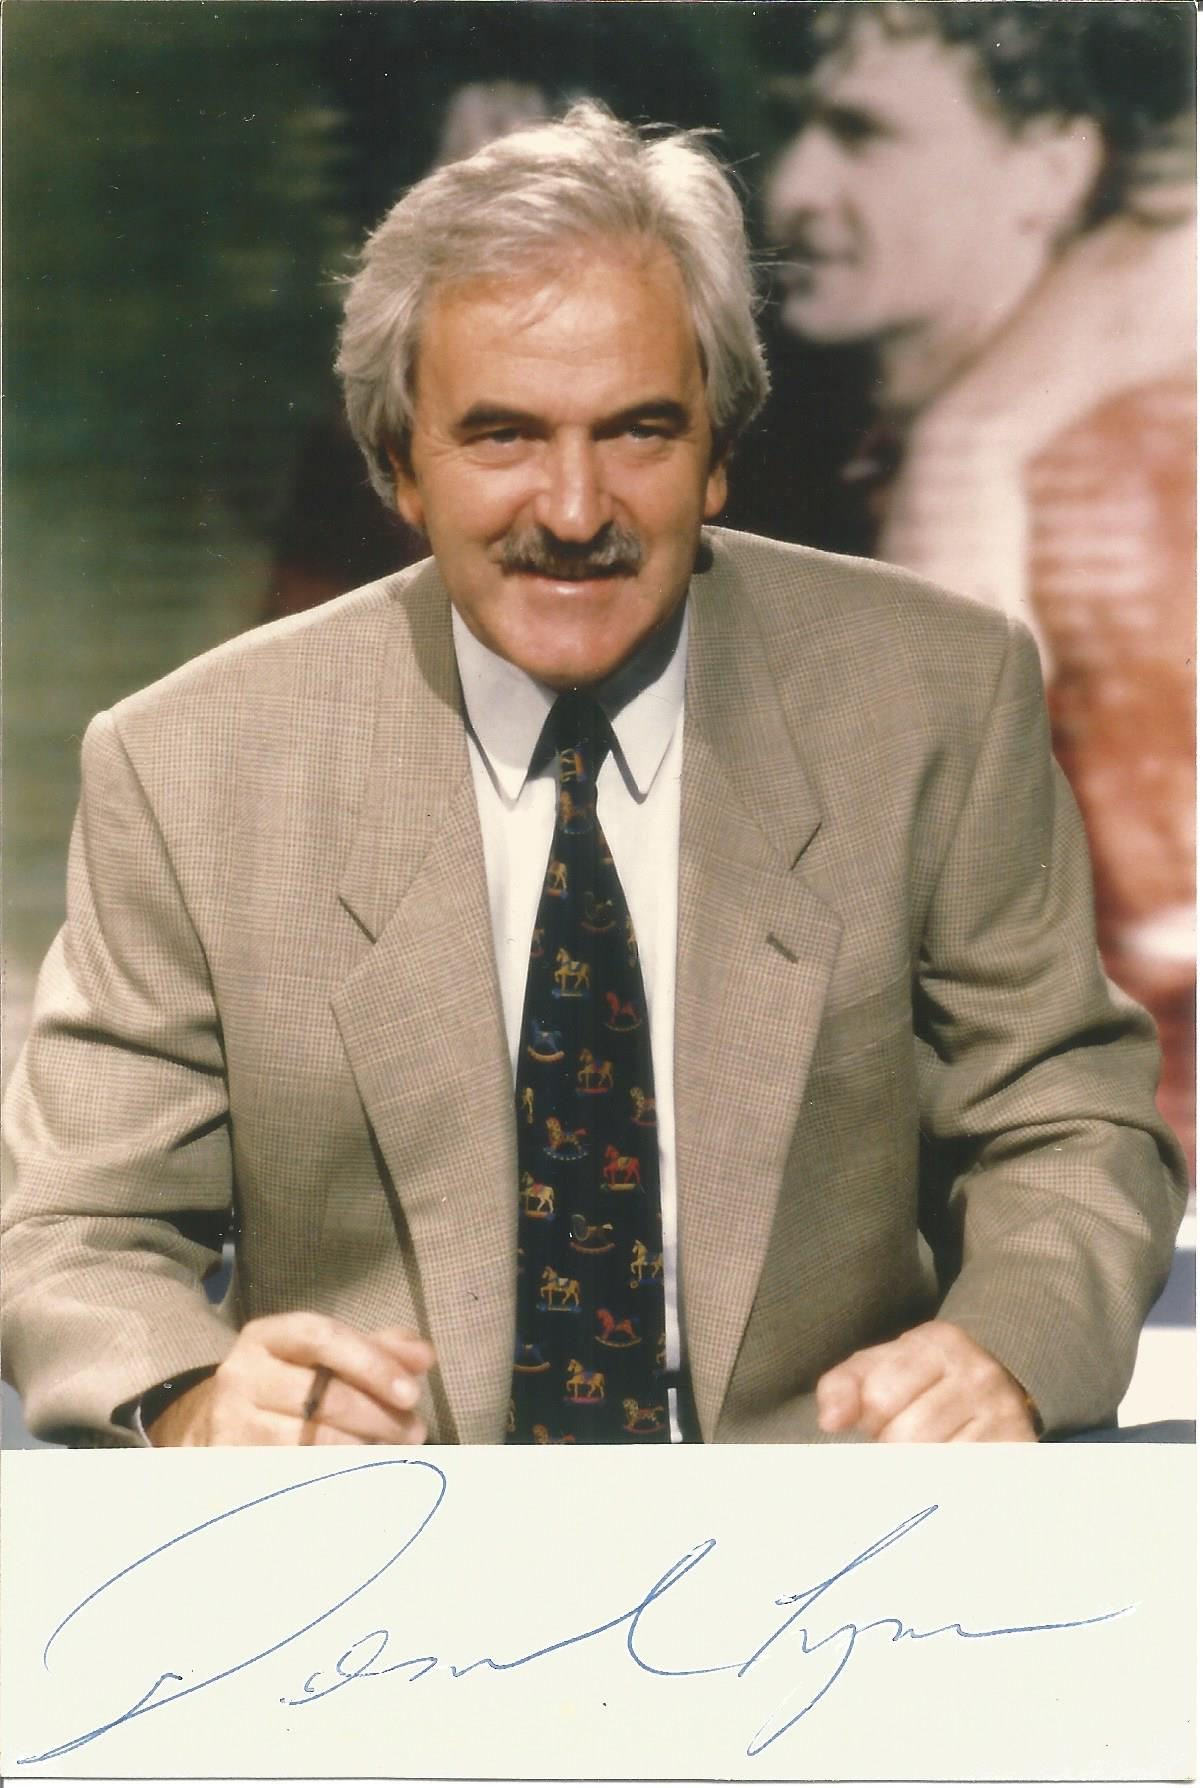 Des Lynam signed 6x4 colour photo. Desmond Michael Lynam, OBE (born 17 September 1942) is an Irish-